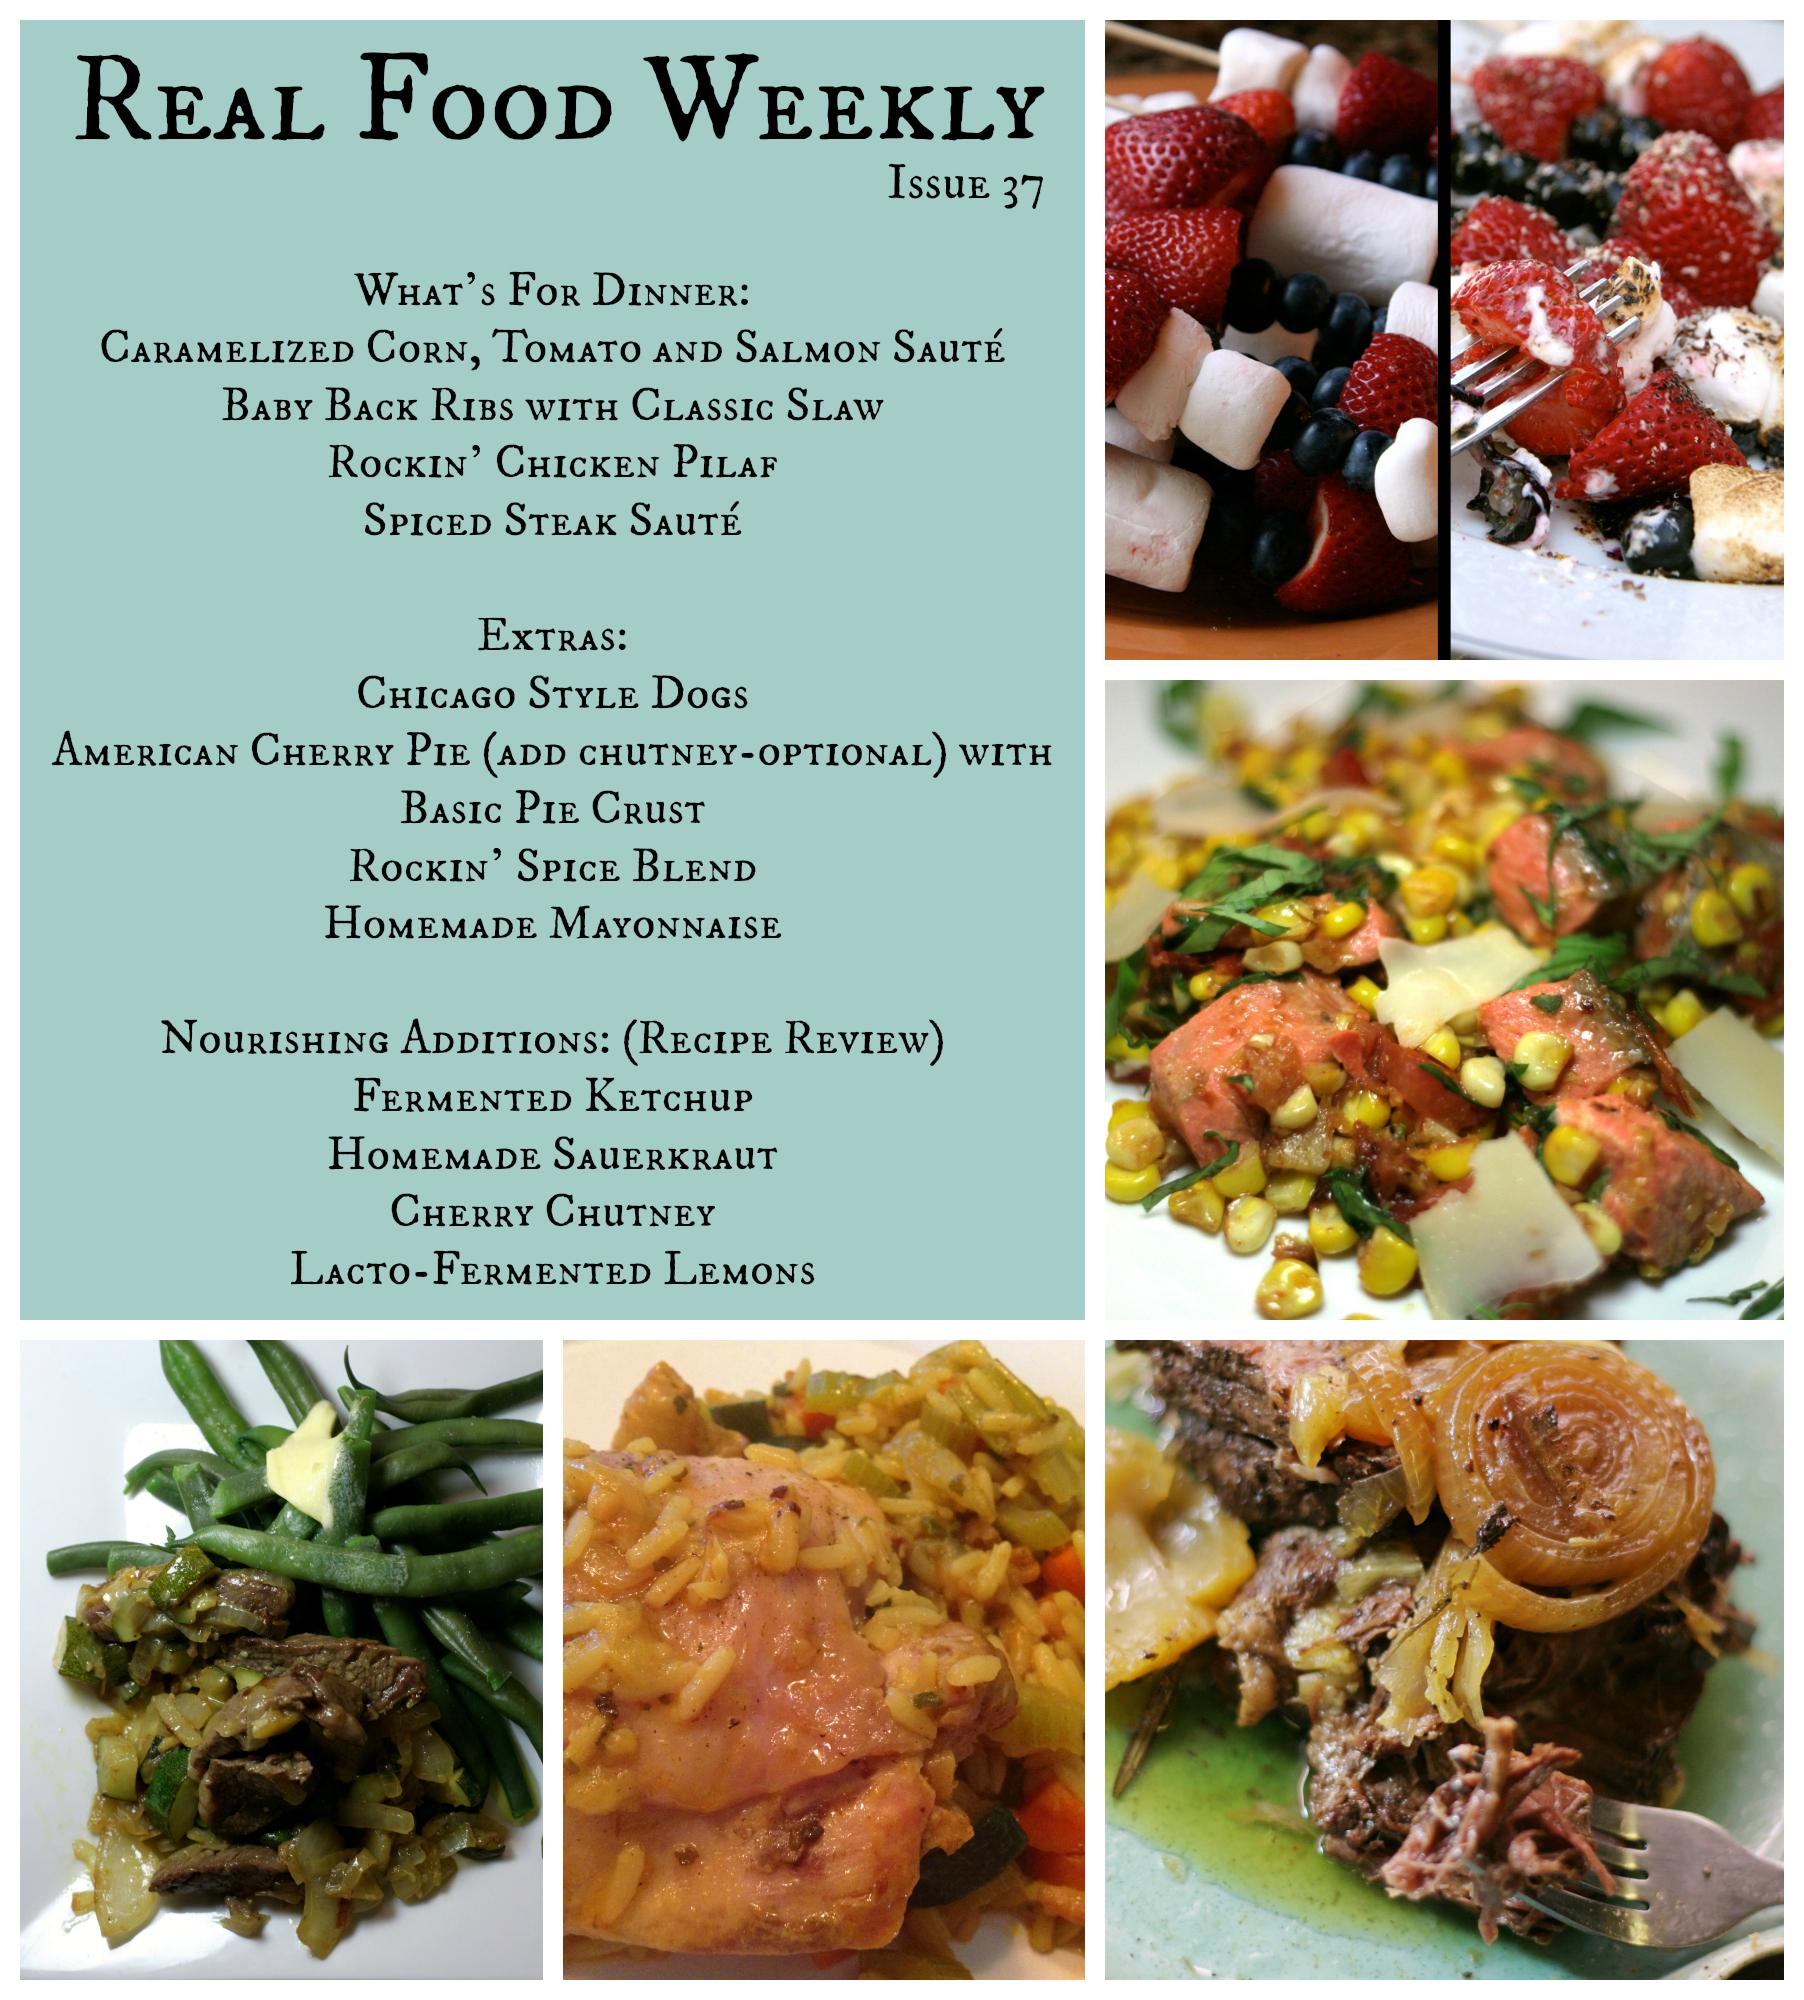 June 29, 2013 Meal Plan